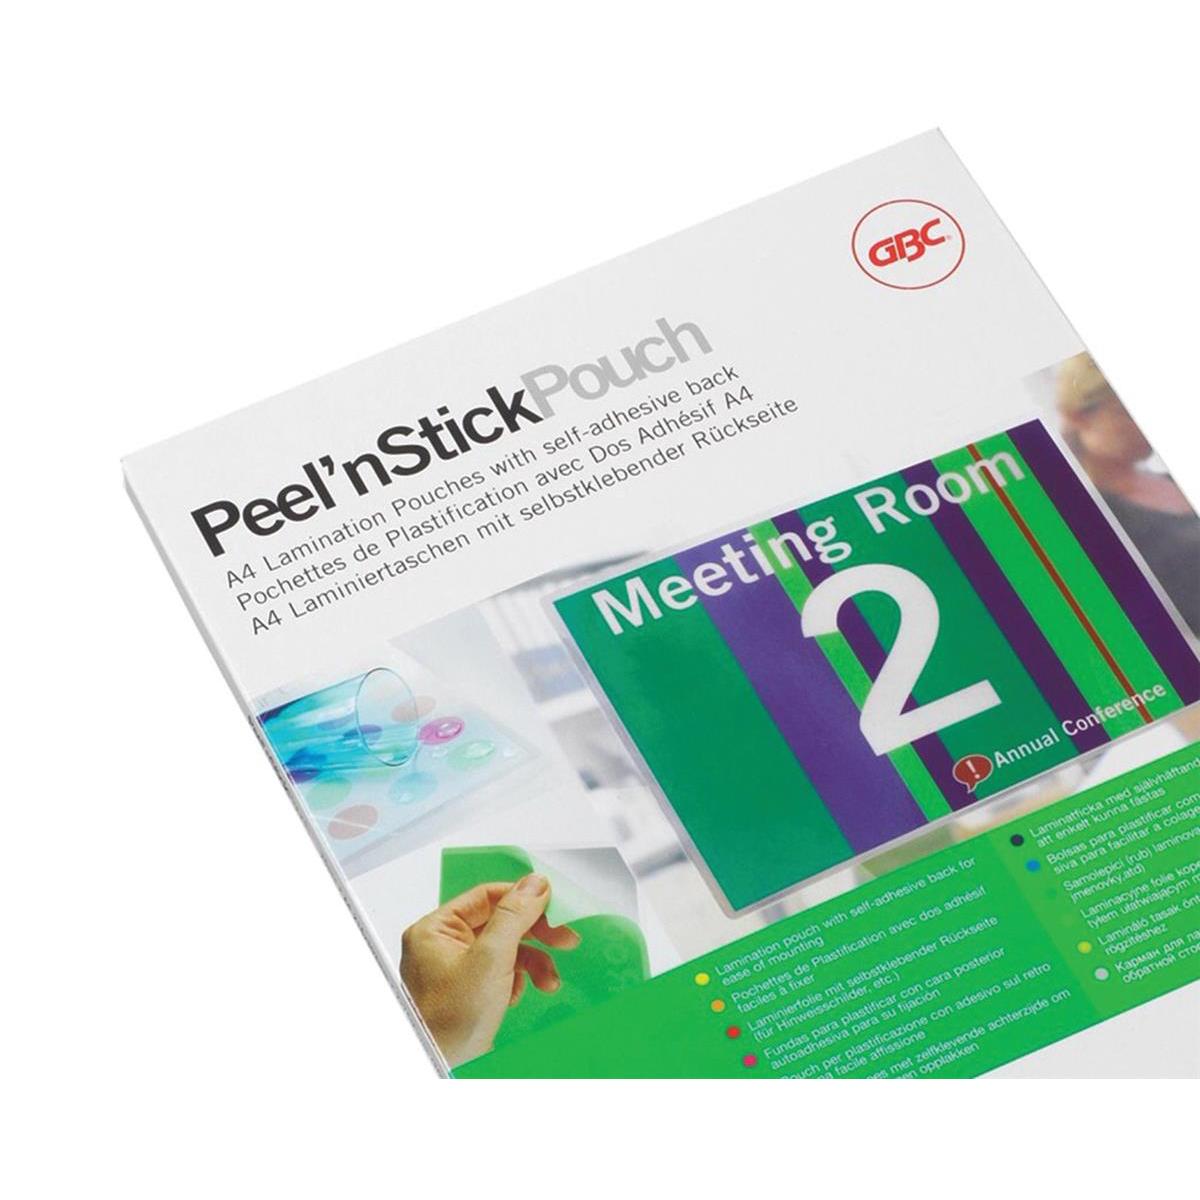 GBC Peel nStick Laminating Pouches Gloss 200 Micron A4 Ref 41666E Pack 100